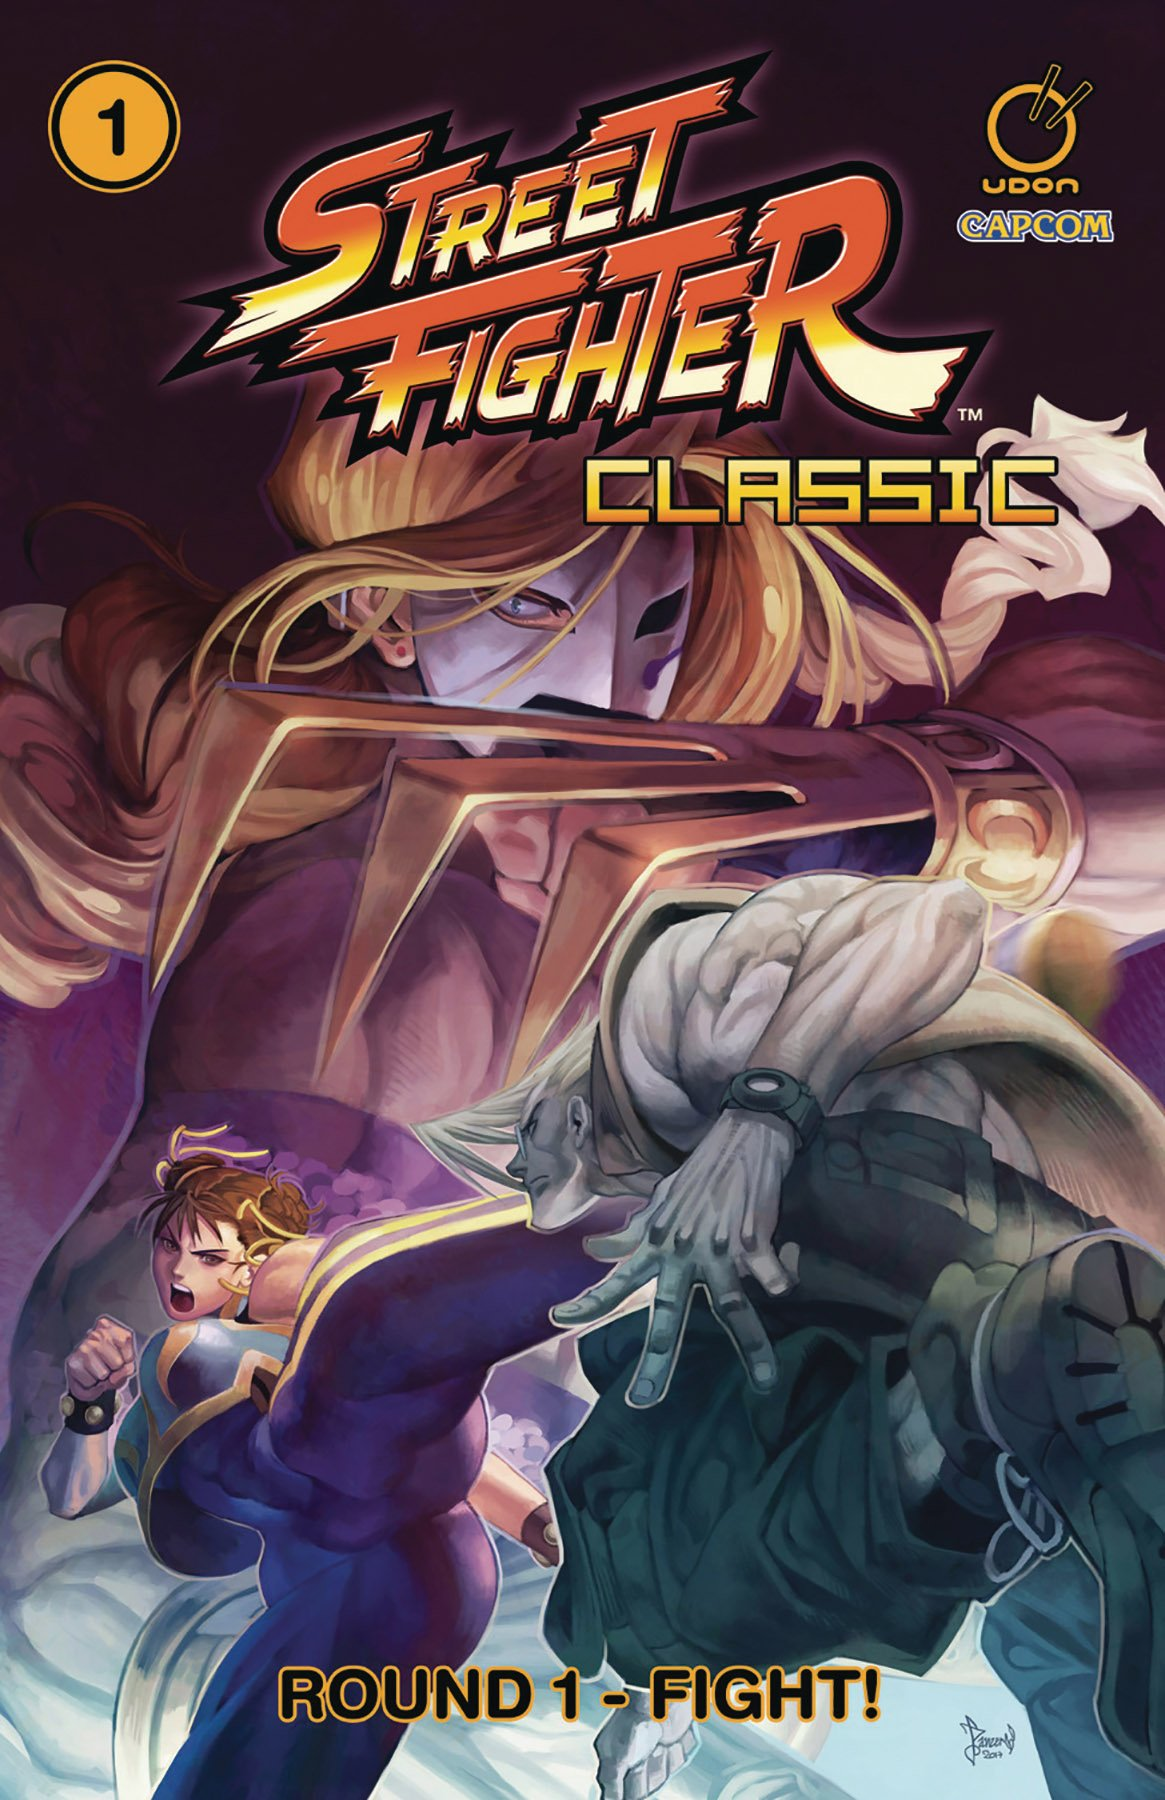 Street Fighter Classic TPB Vol.1 Round 1 - Fight!